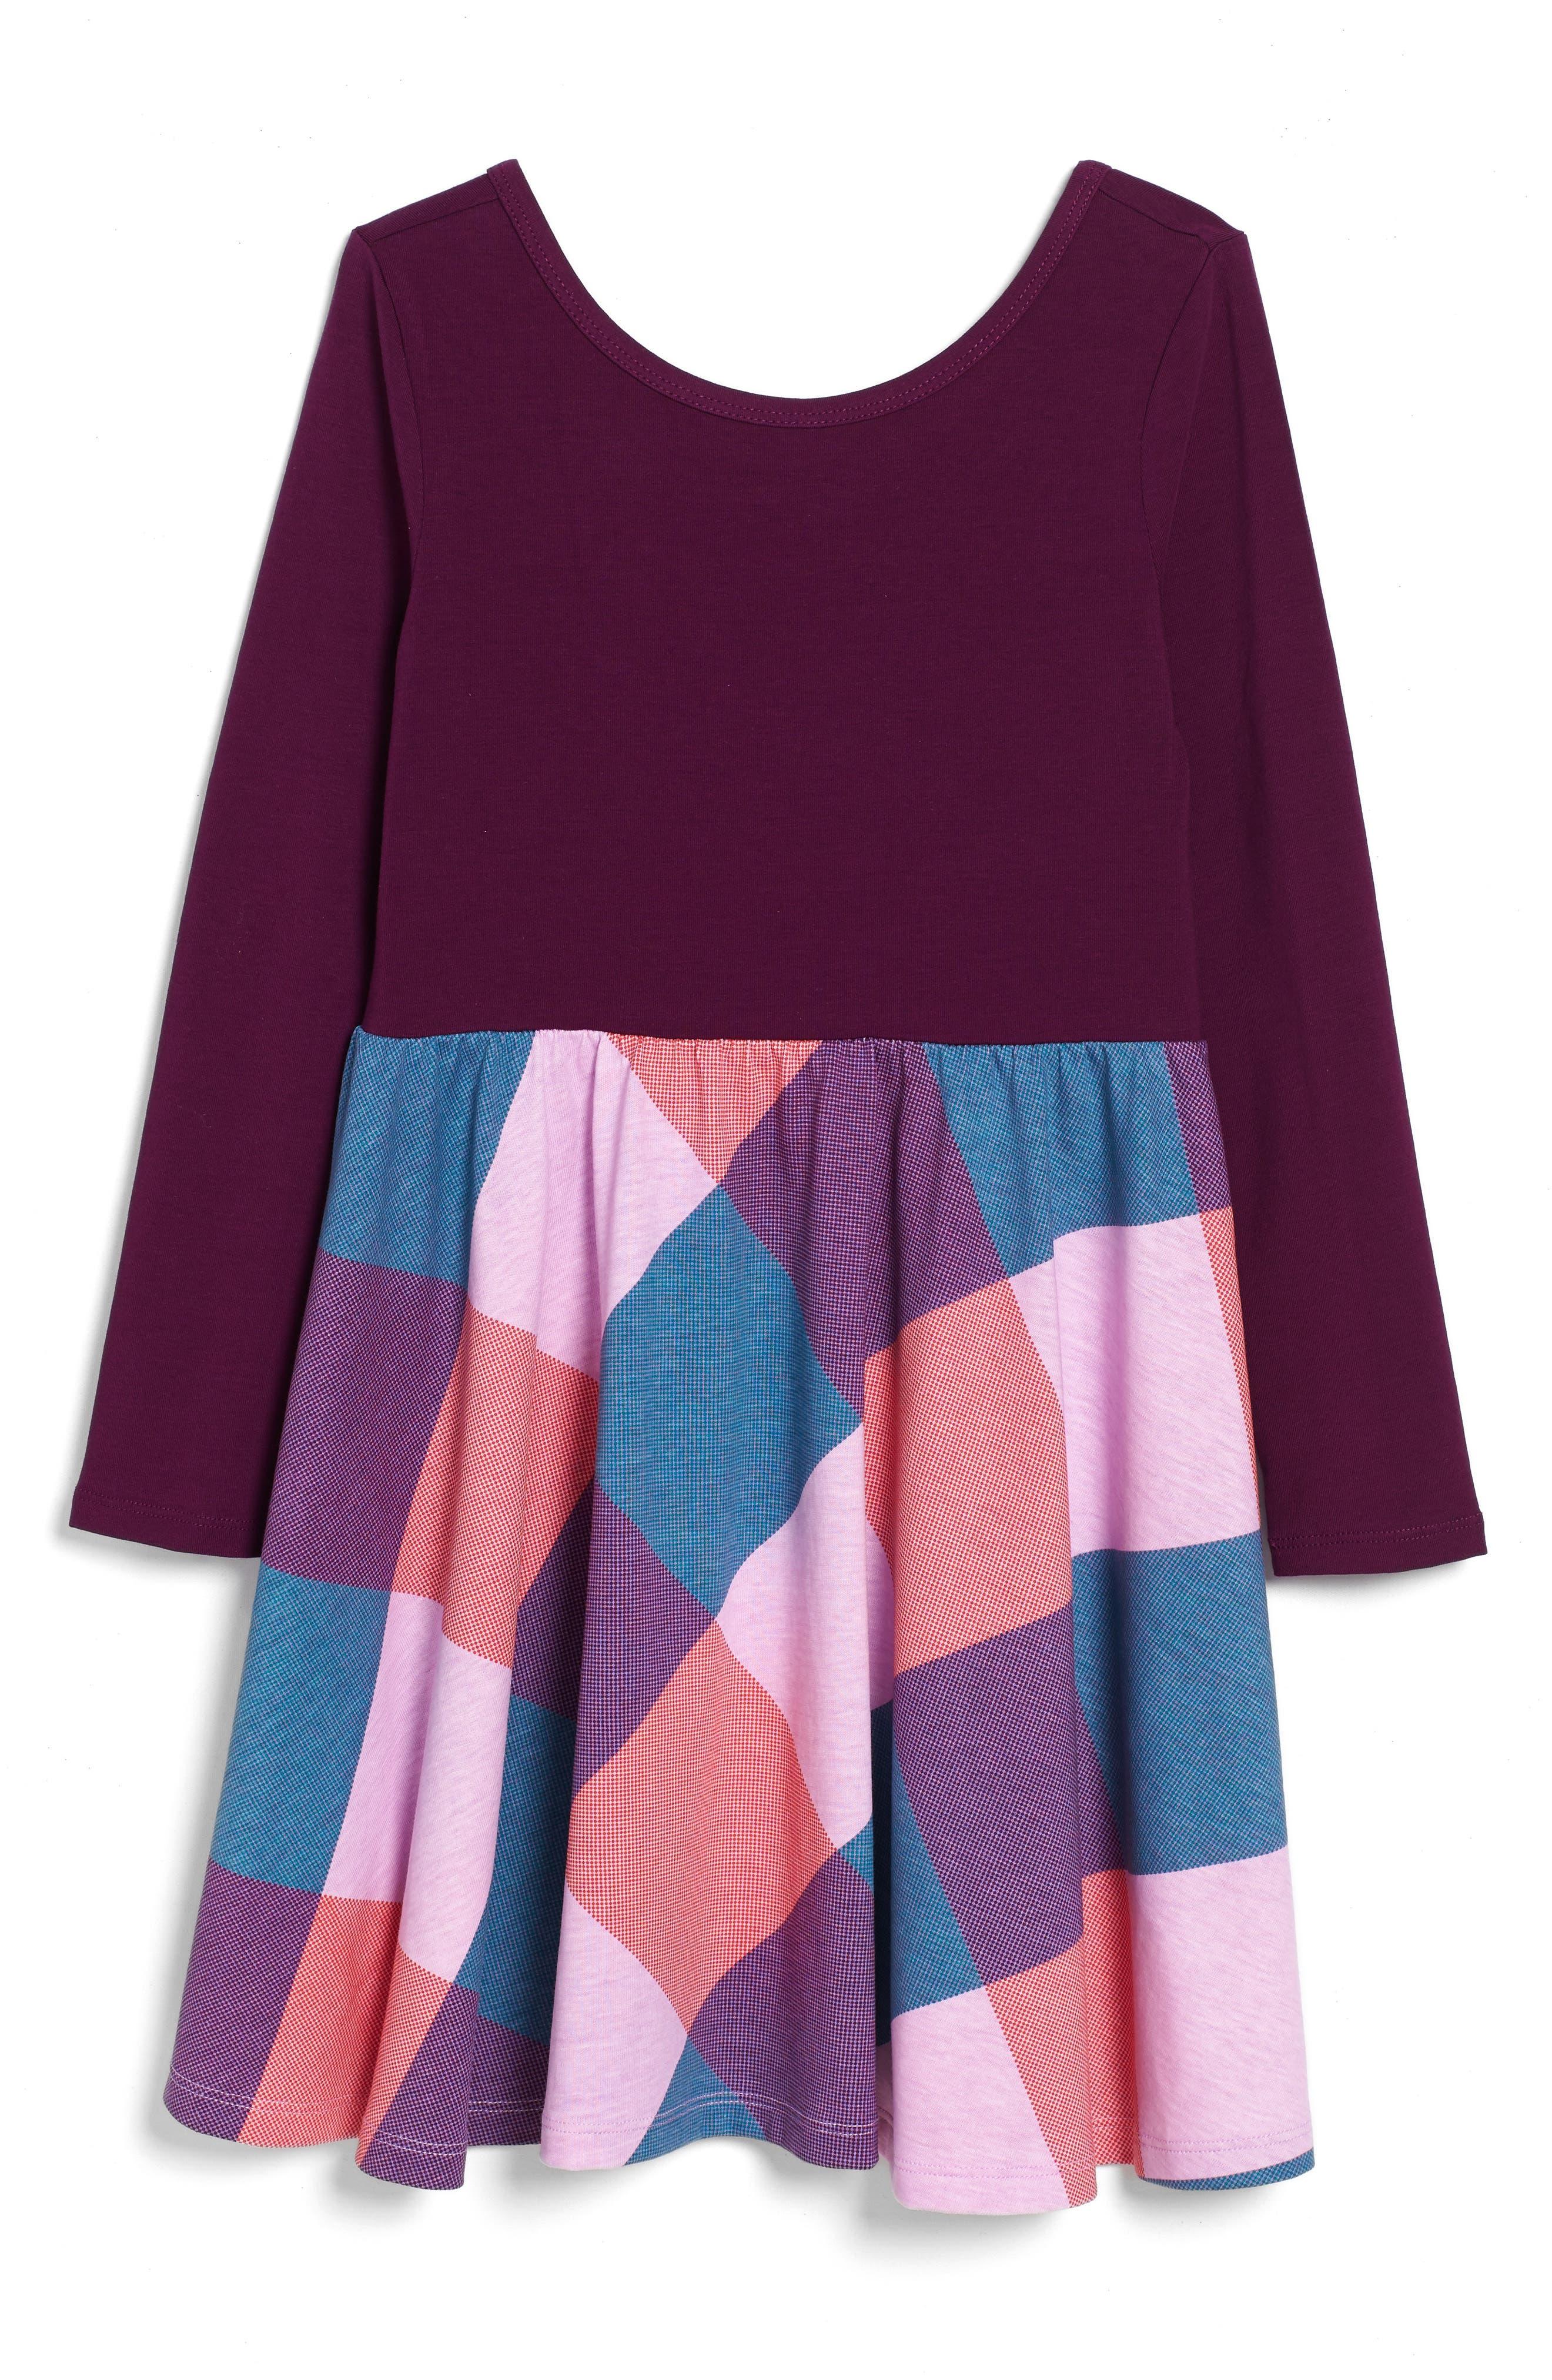 Main Image - Tea Collection Dahlia Skirted Dress (Toddler Girls, Little Girls & Big Girls)